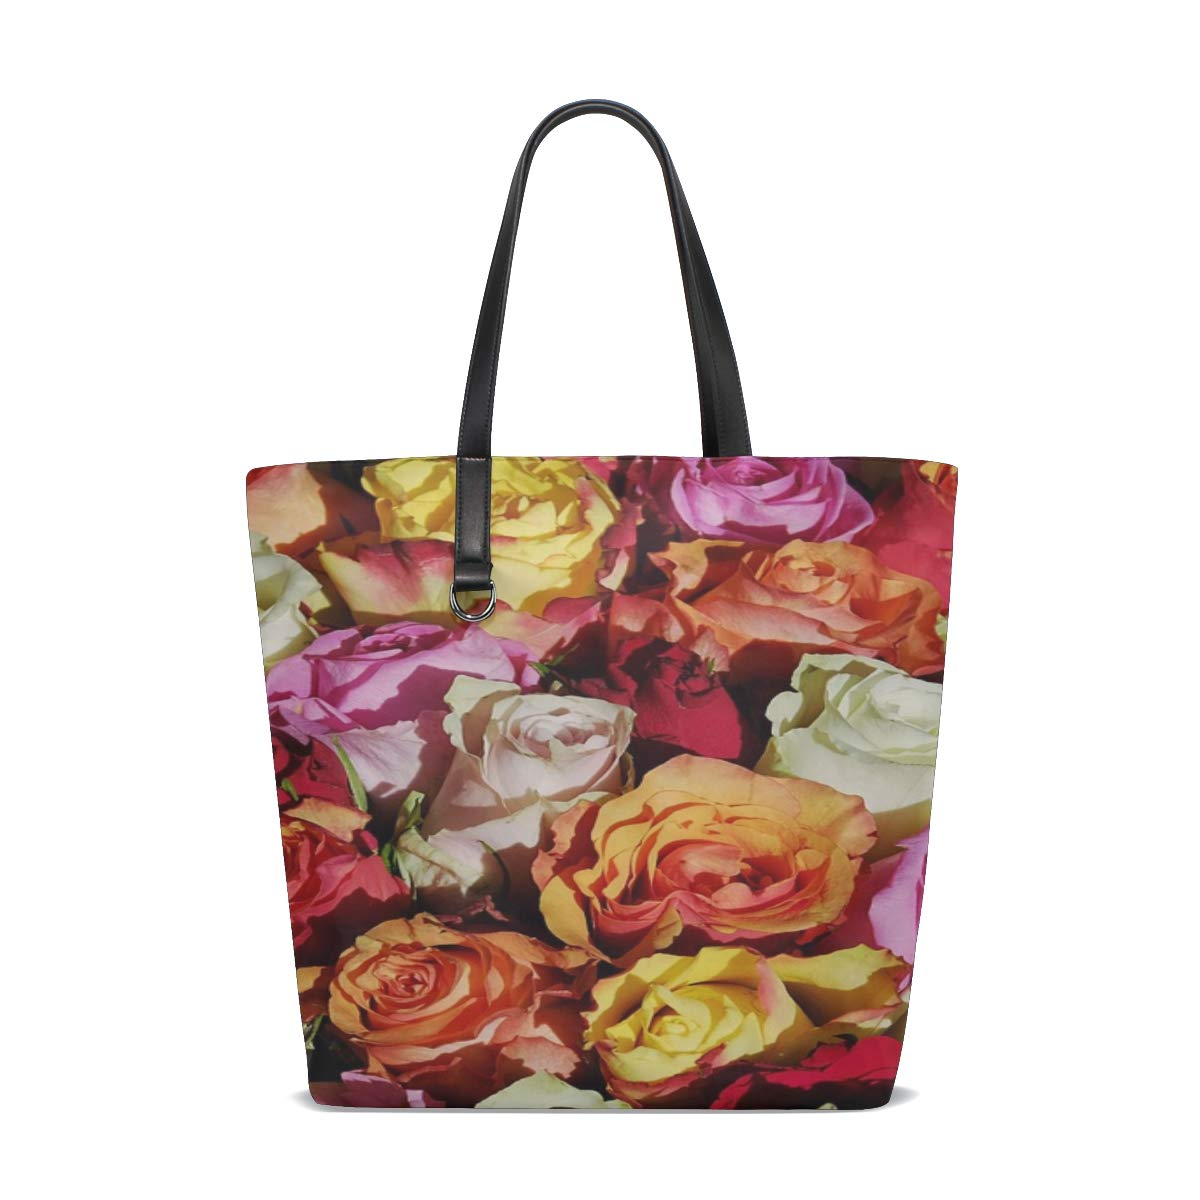 Womens Leather Roses Flowers Floral Handbag Satchel Tote Bag Tote Purse